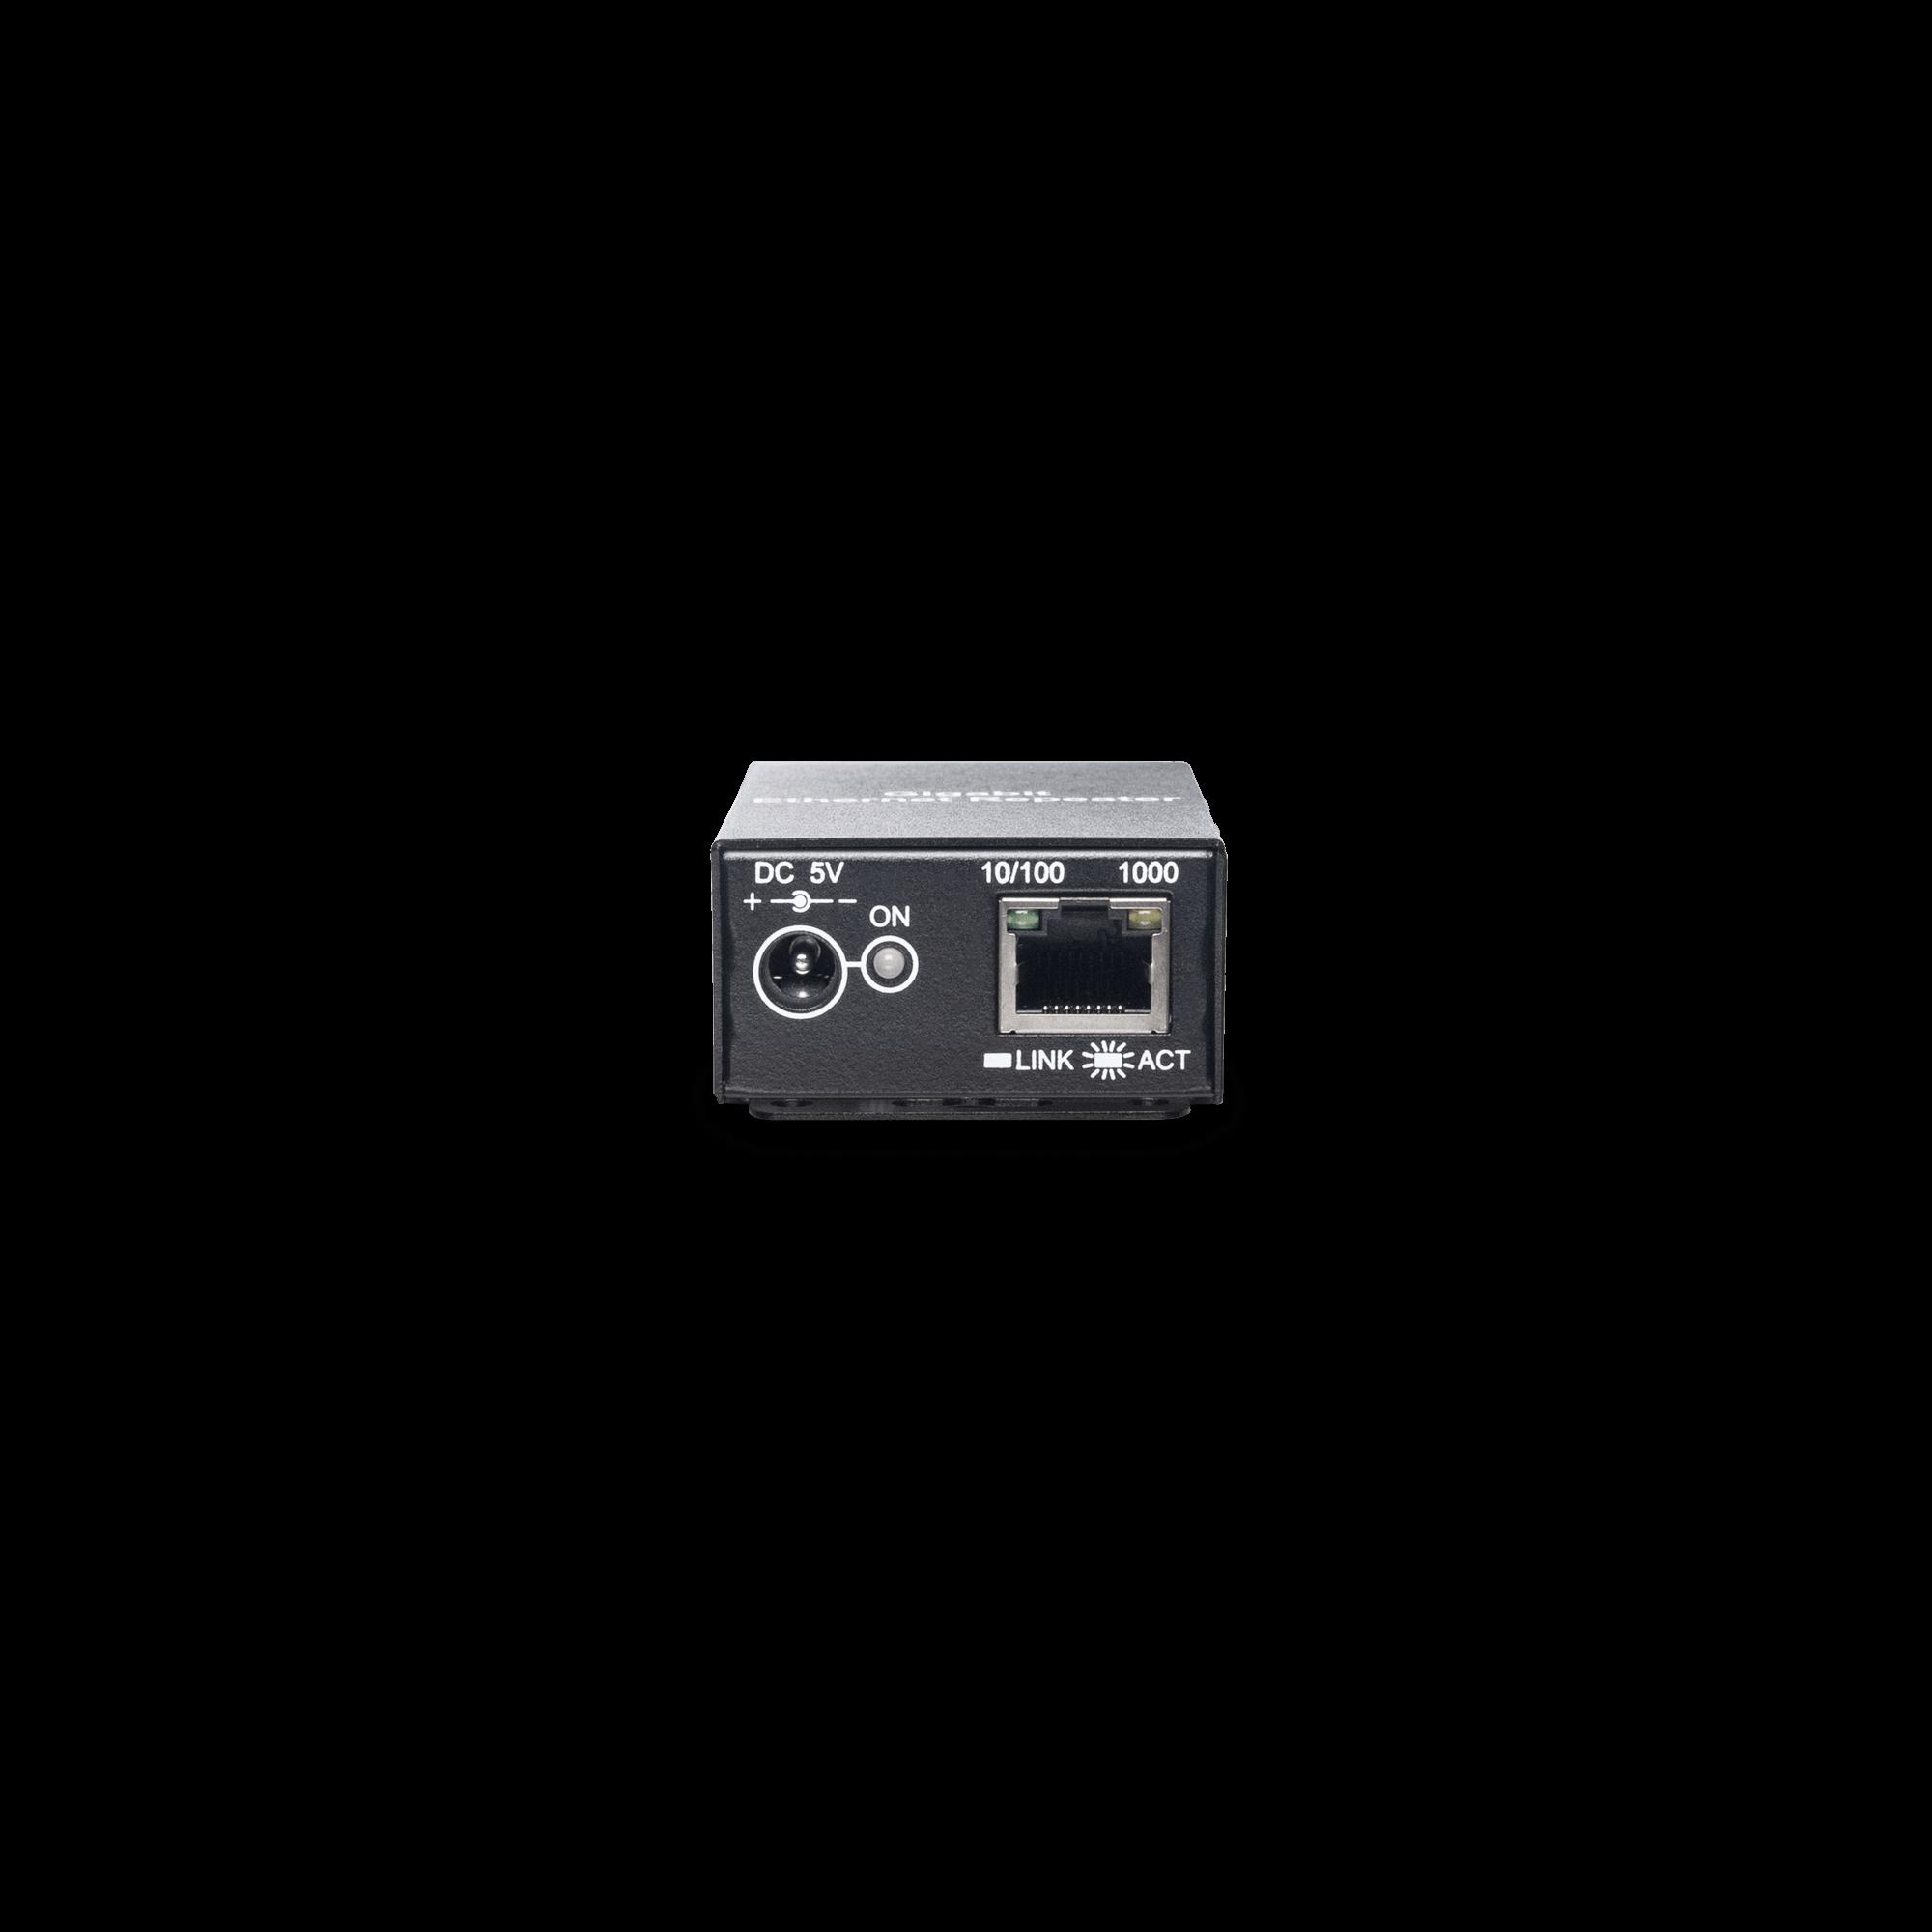 Gigabit Ethernet Repeater